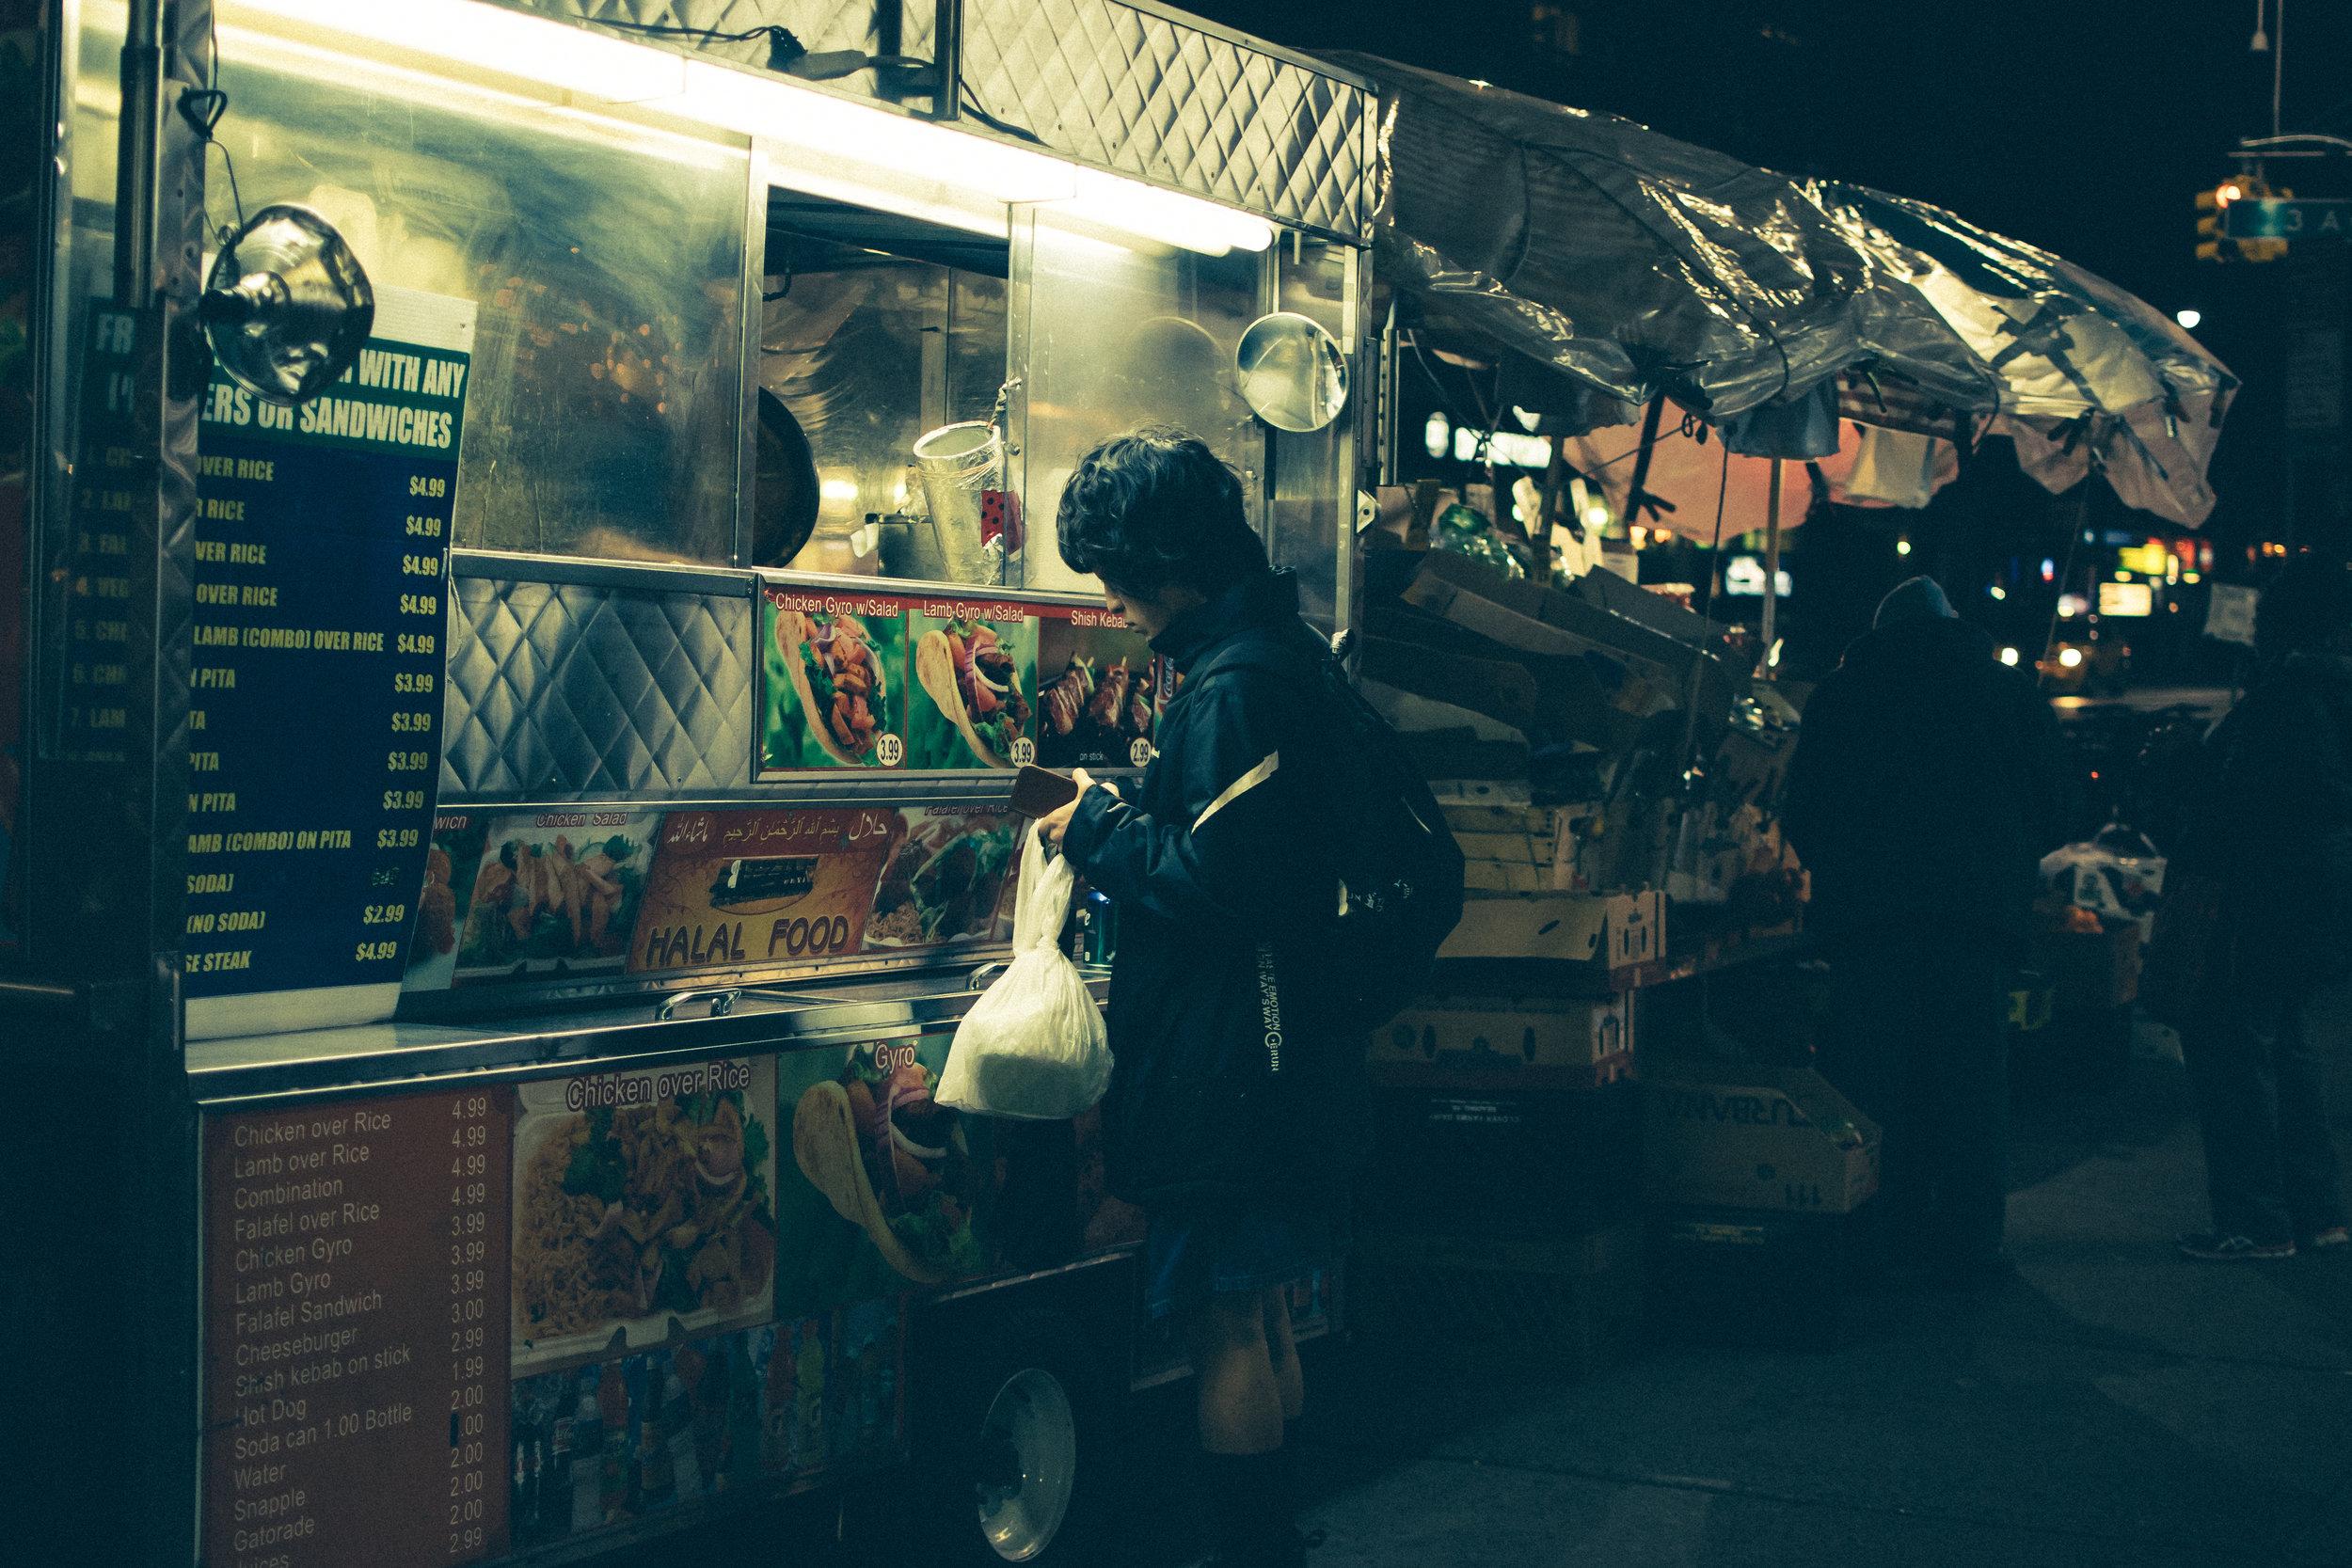 Kyle Studstill_Composure_New York City-9-2.jpg